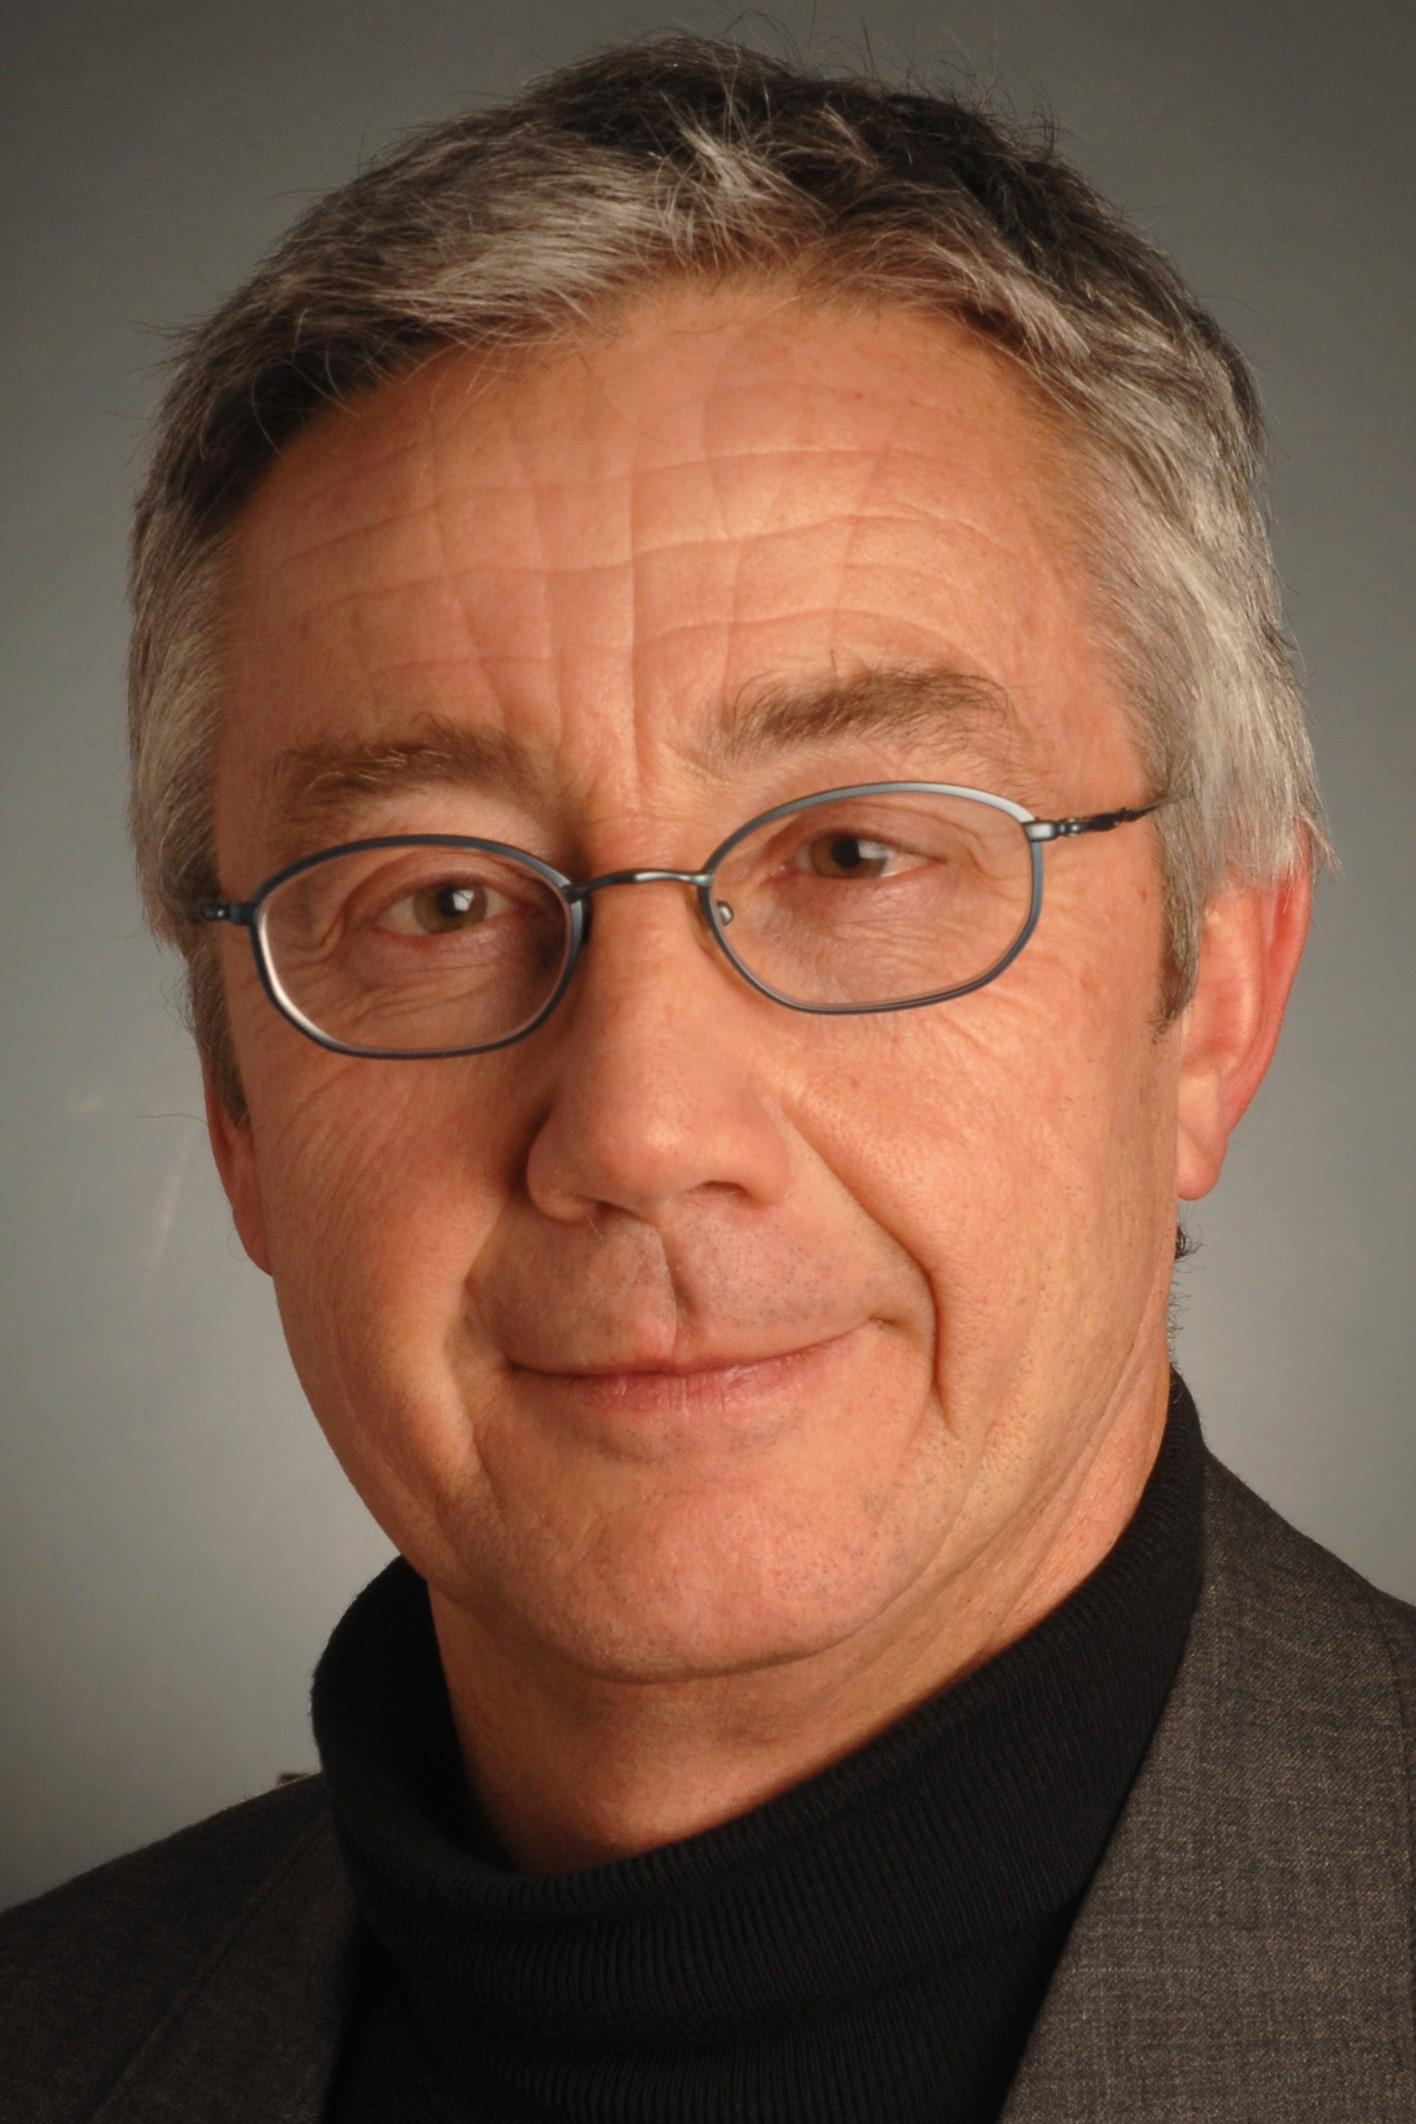 Andreas Stalder